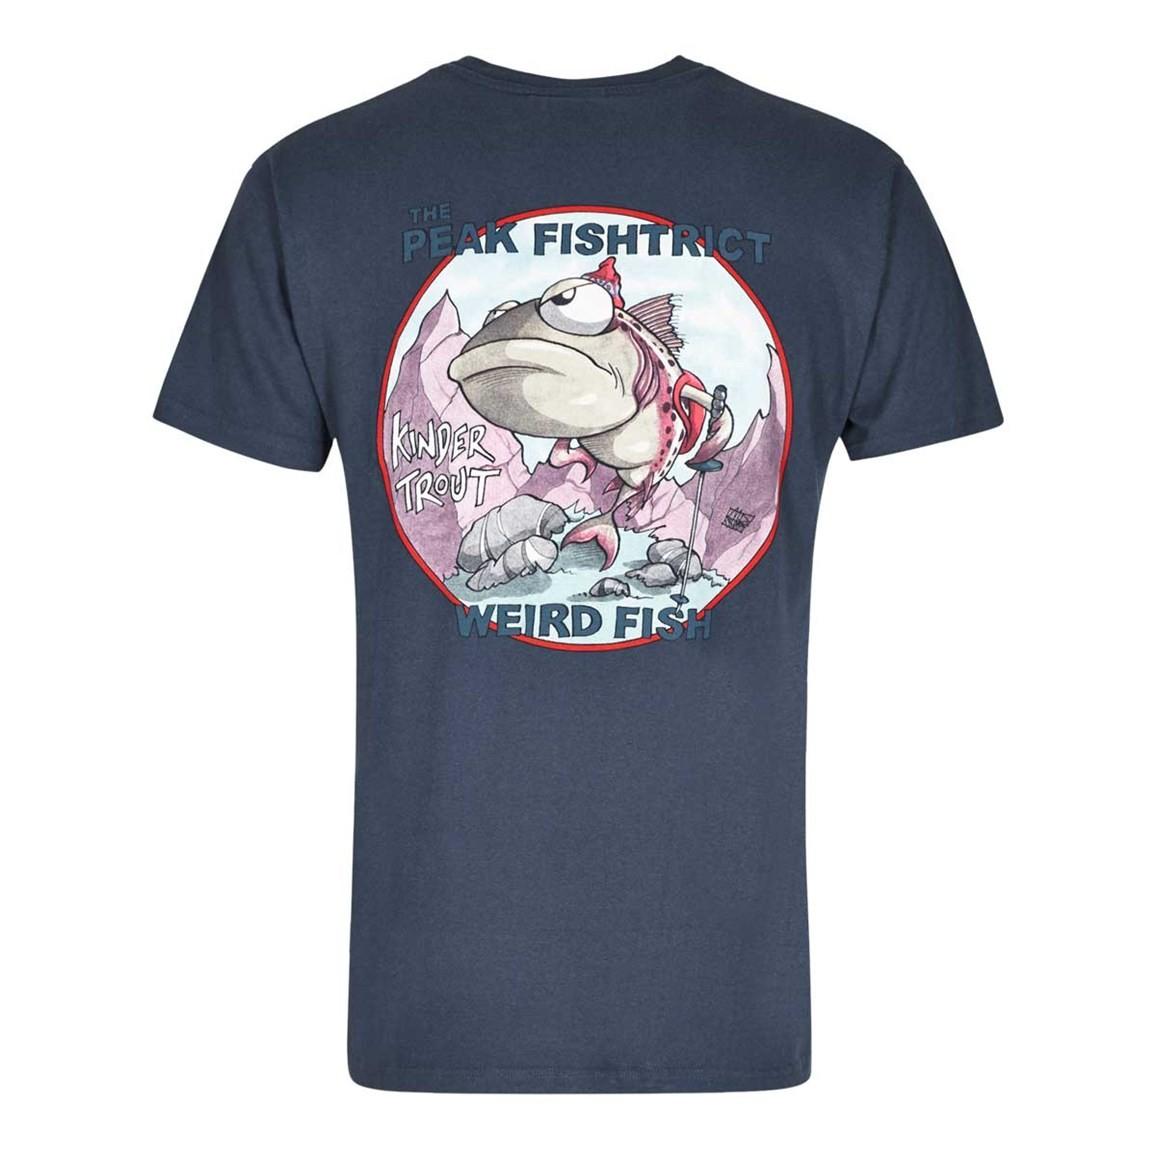 Peak Fishtrict Printed Artist T-Shirt Dark Navy